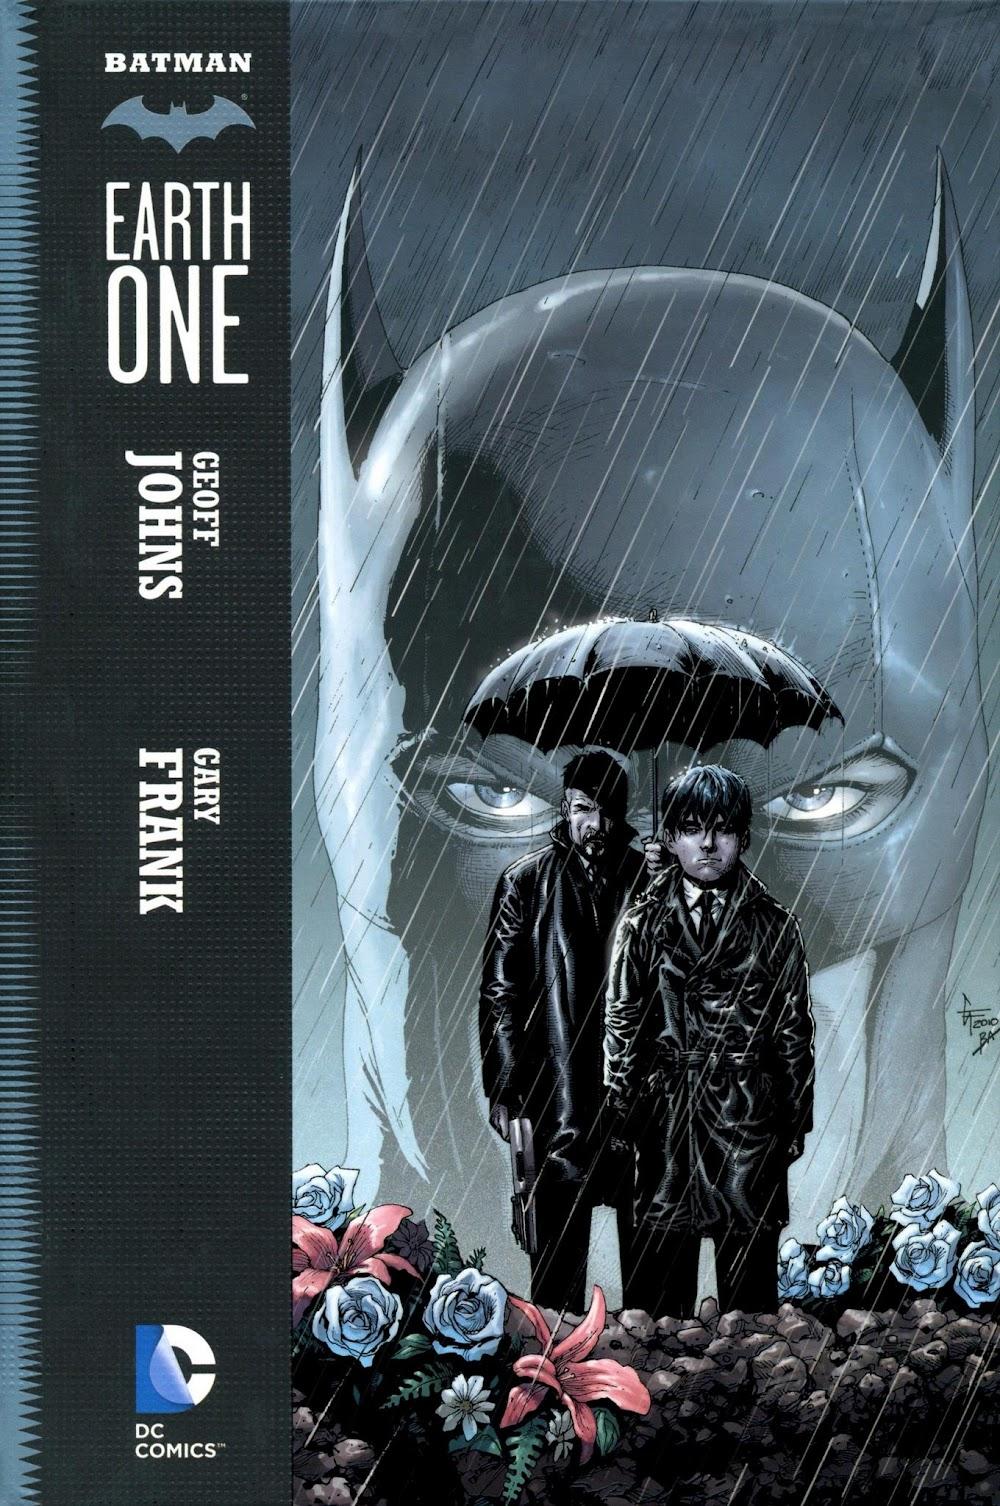 Batman - Earth One Vol. 1 (2012)